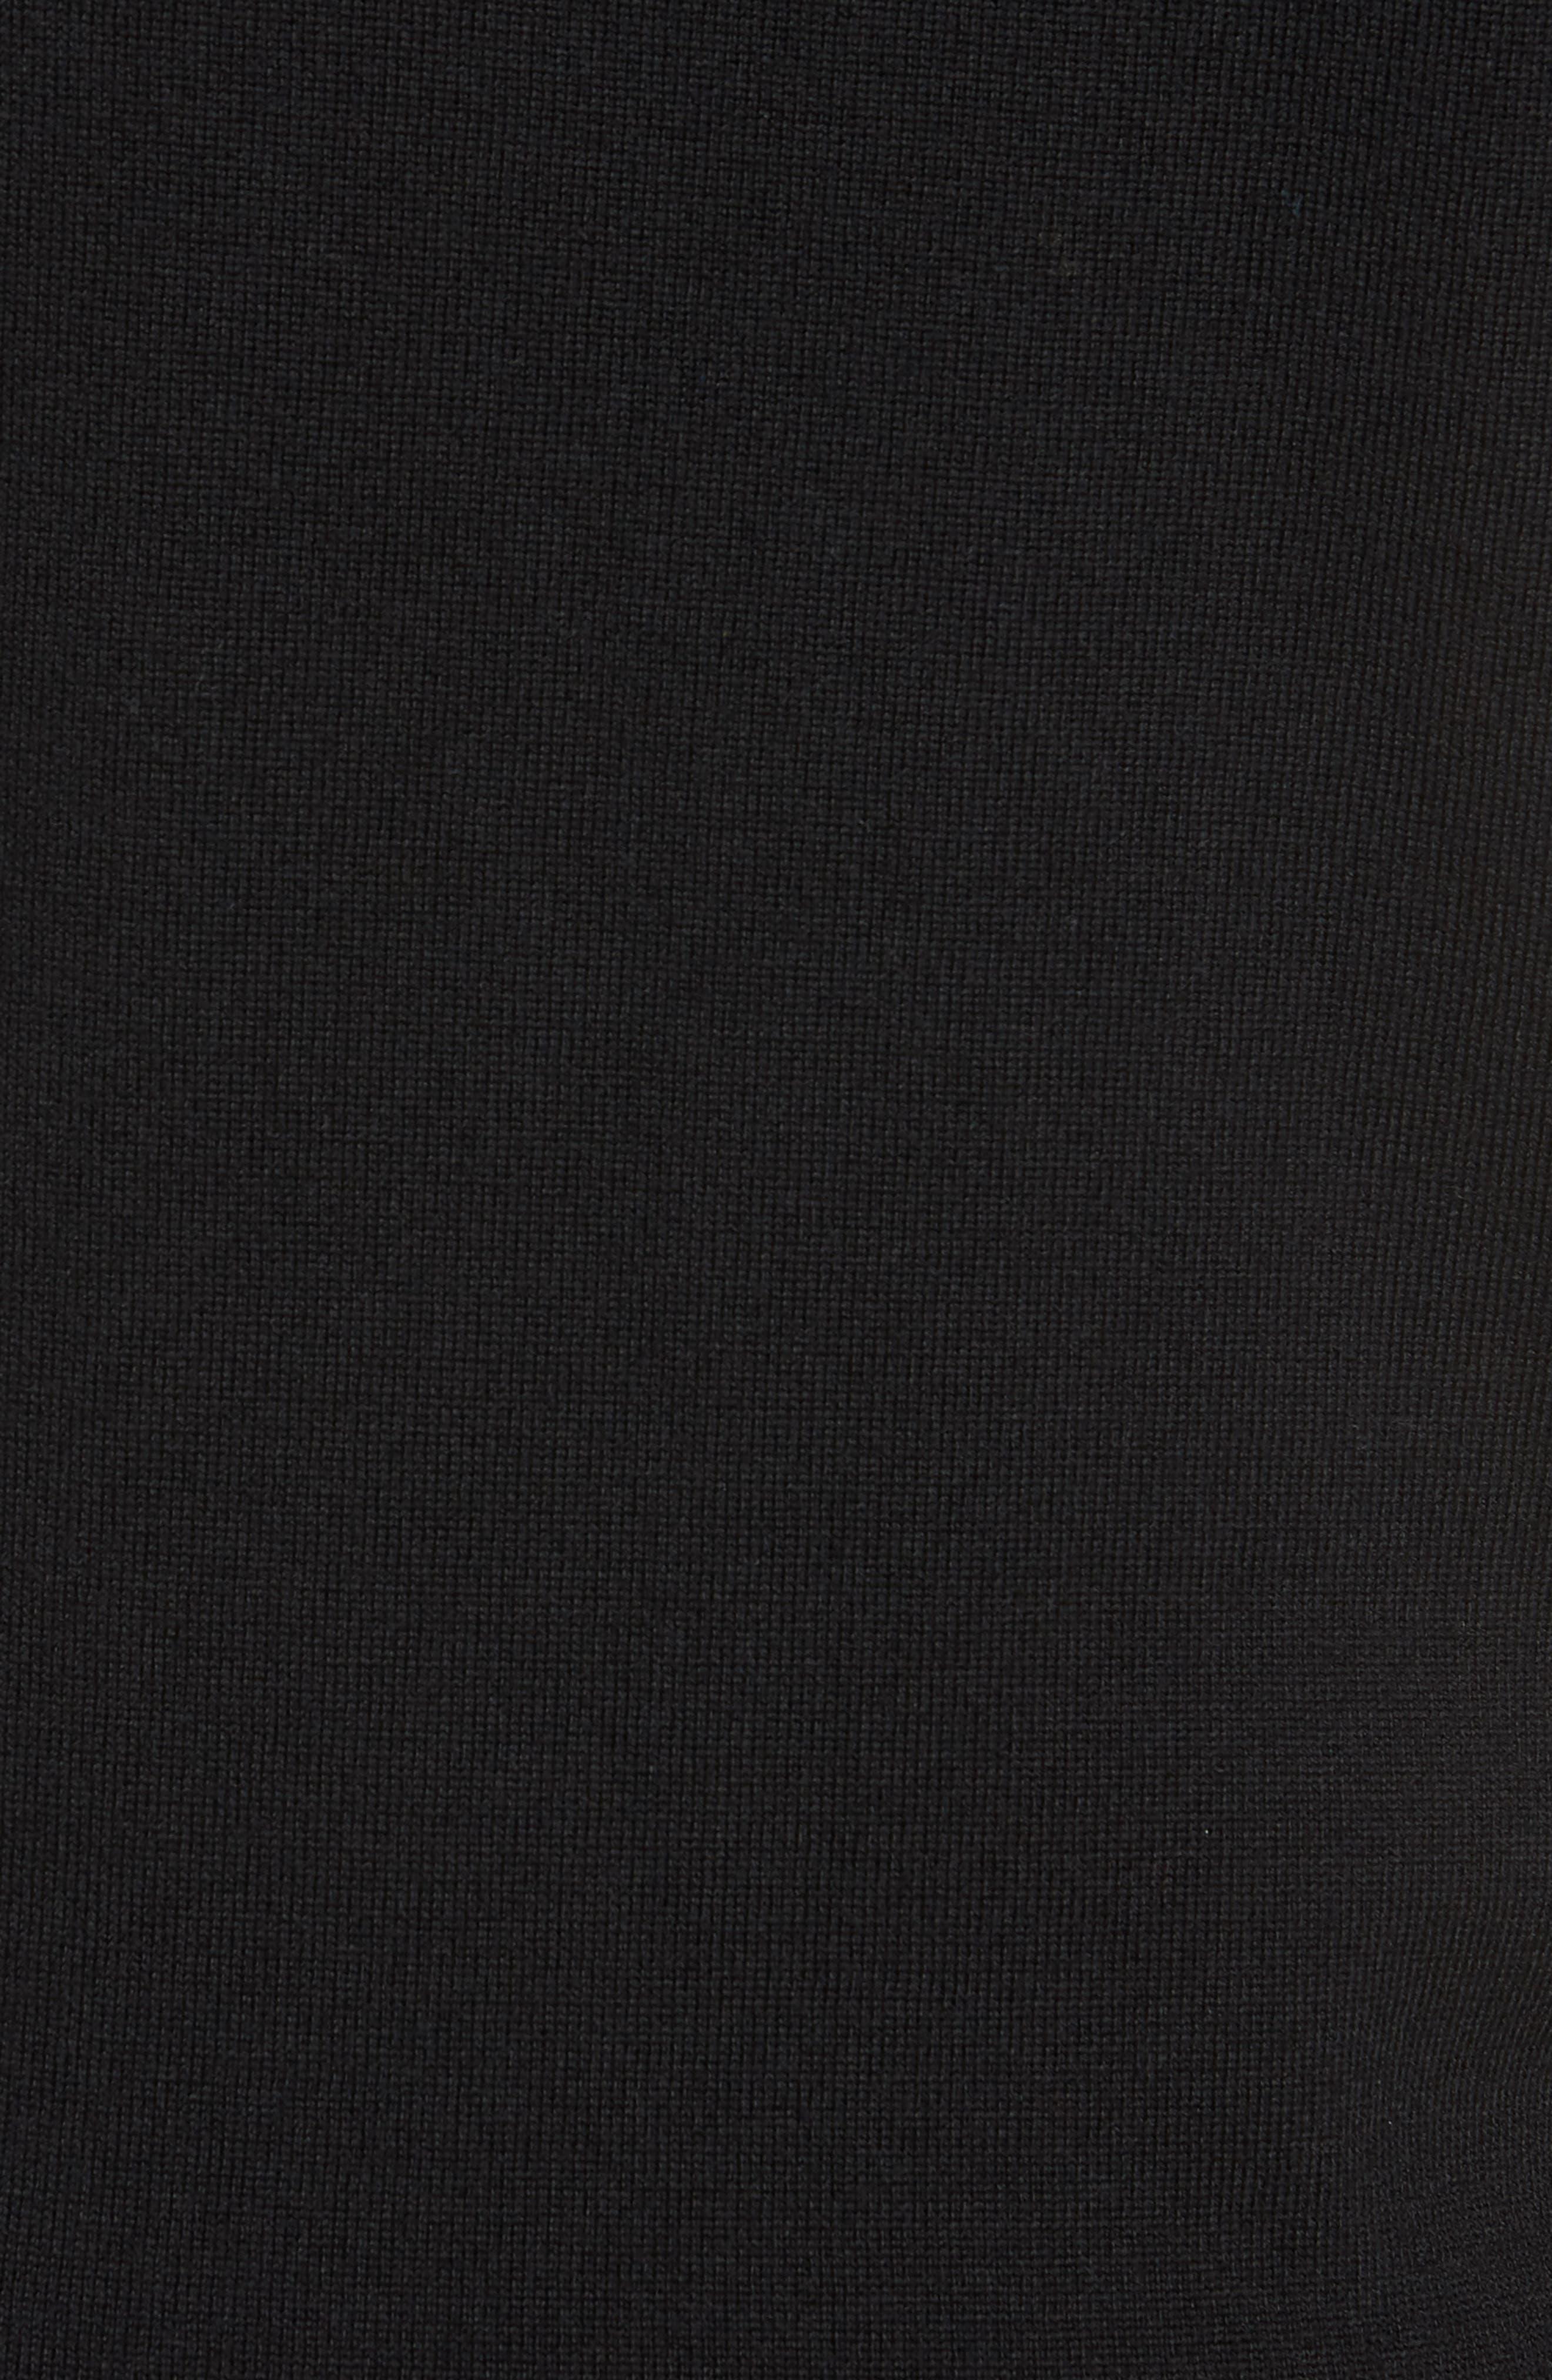 Regular Fit Merino Wool V-Neck Sweater,                             Alternate thumbnail 5, color,                             BLACK CAVIAR